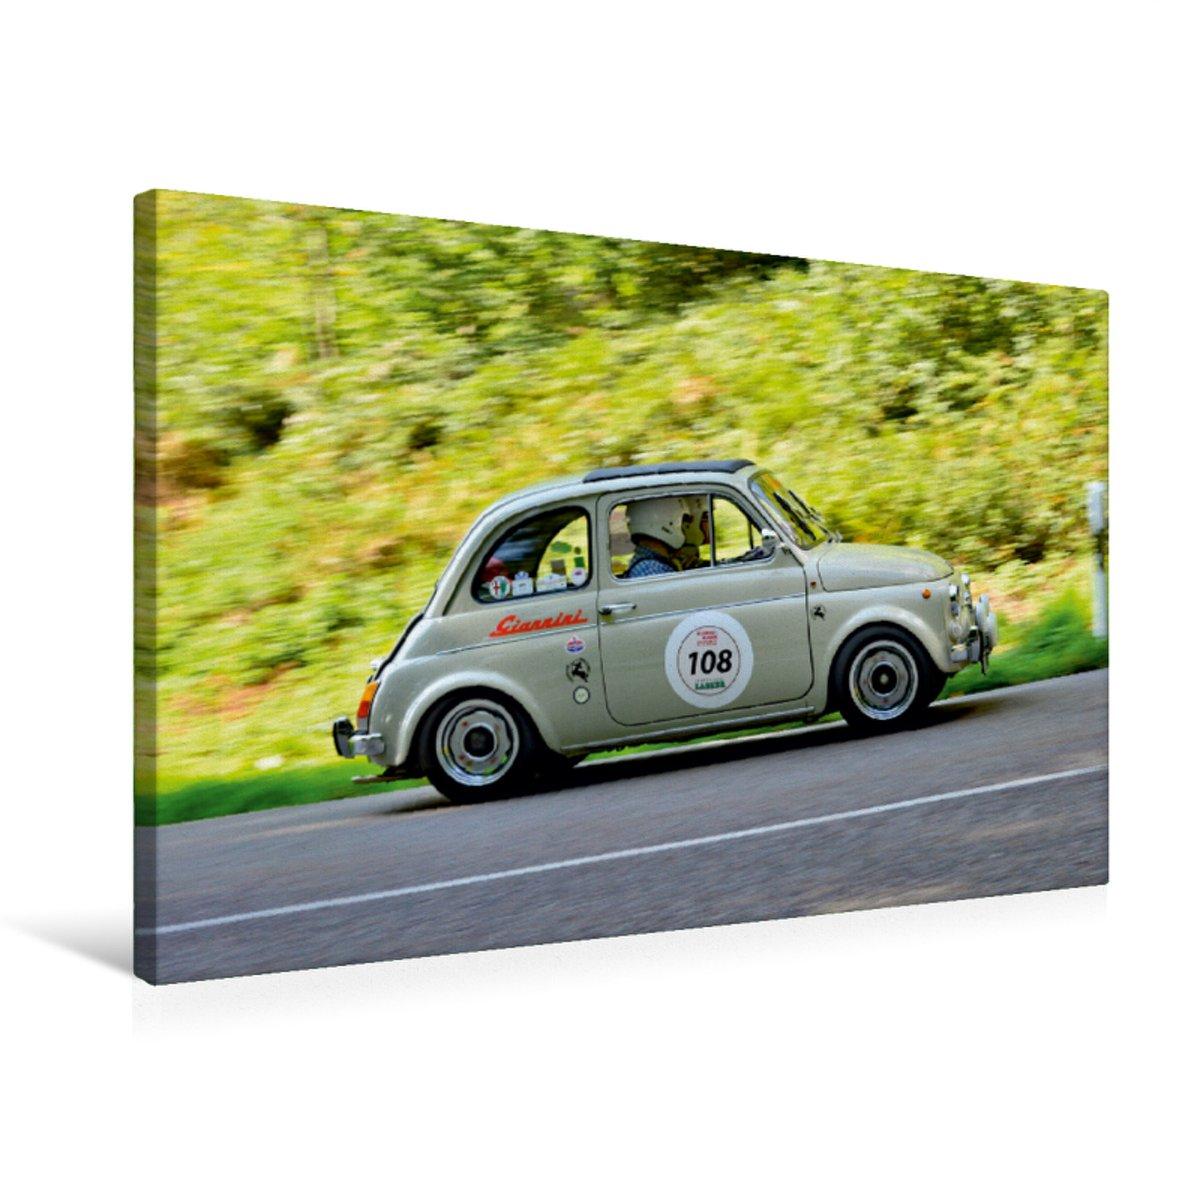 Premium Textil-Leinwand 75 x 50 cm Quer-Format Fiat Giannini 500 Tributo Montecarlo - 1967   Wandbild, HD-Bild auf Keilrahmen, Fertigbild auf hochwertigem Vlies, Leinwanddruck von Ingo Laue